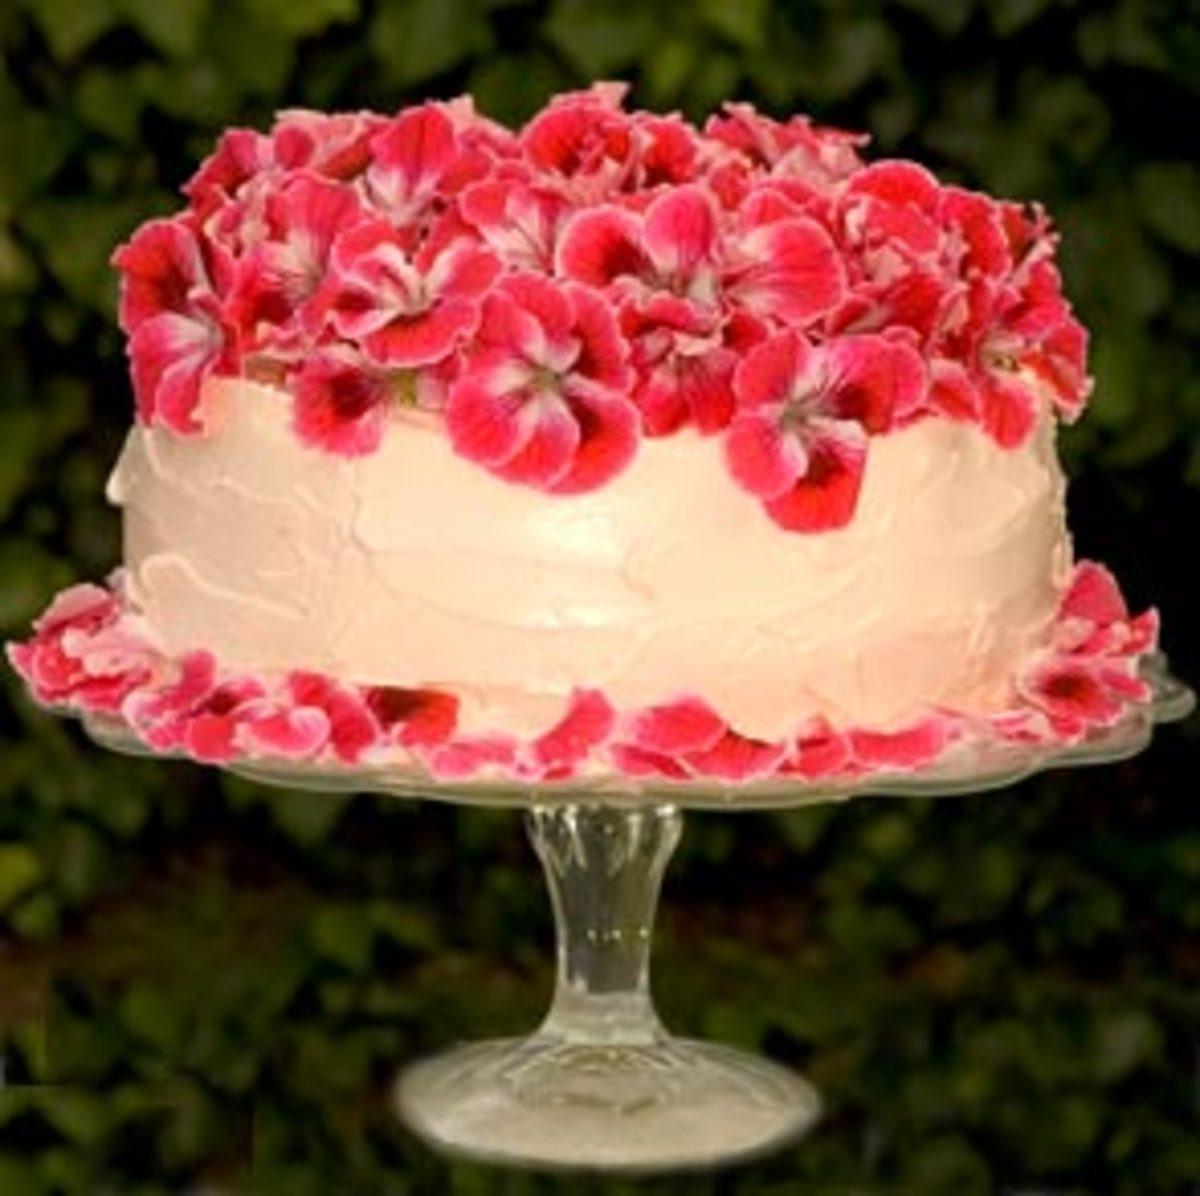 Gorgeous Organic Edible Flower Cake - Organic Authority